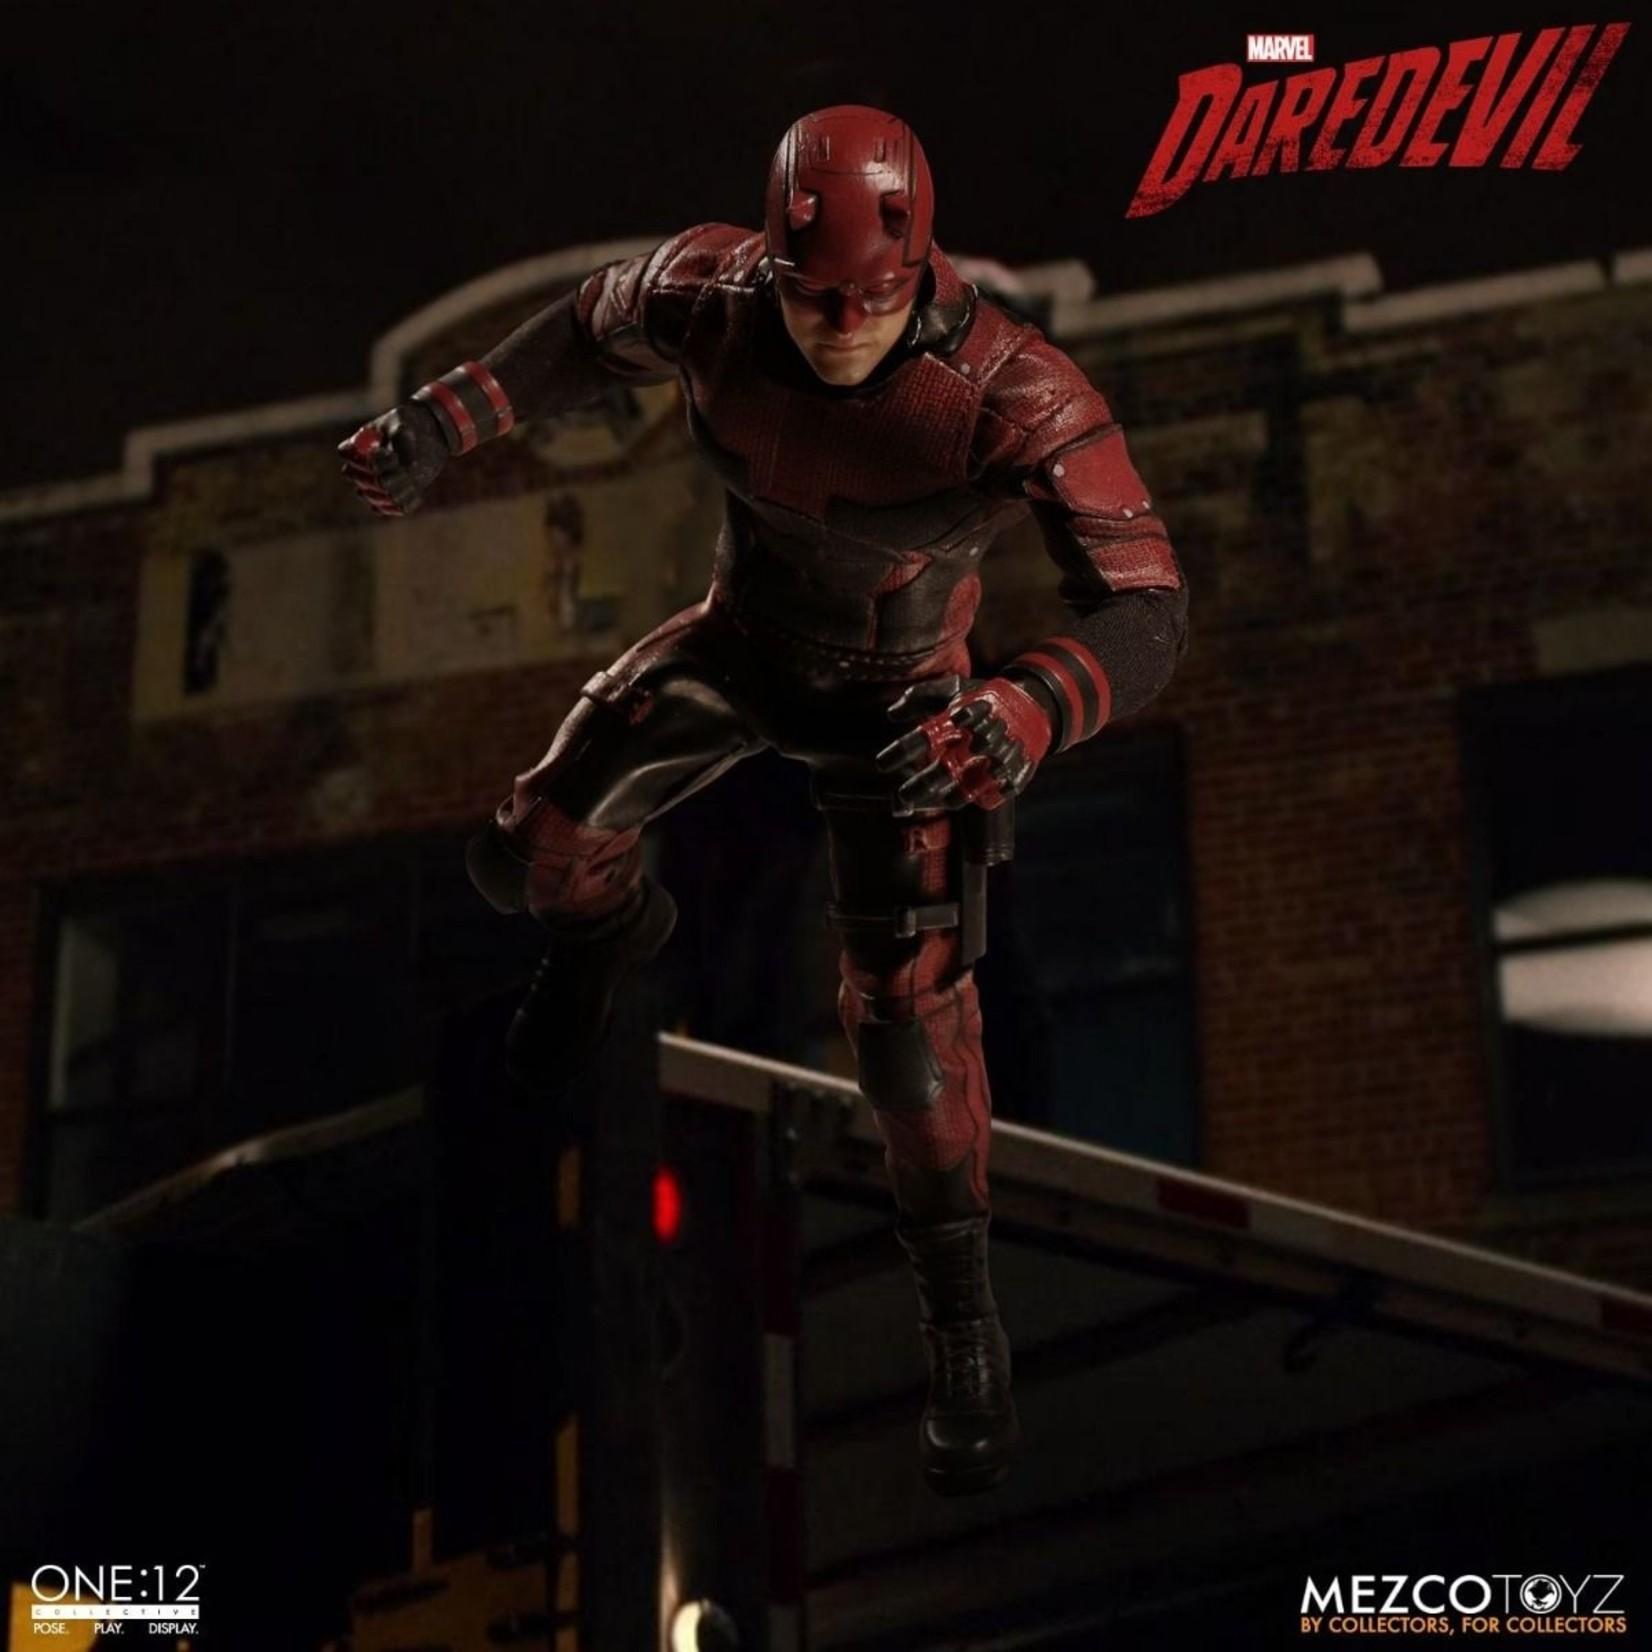 MezcoToyz Marvel - Daredevil (TV Serie)